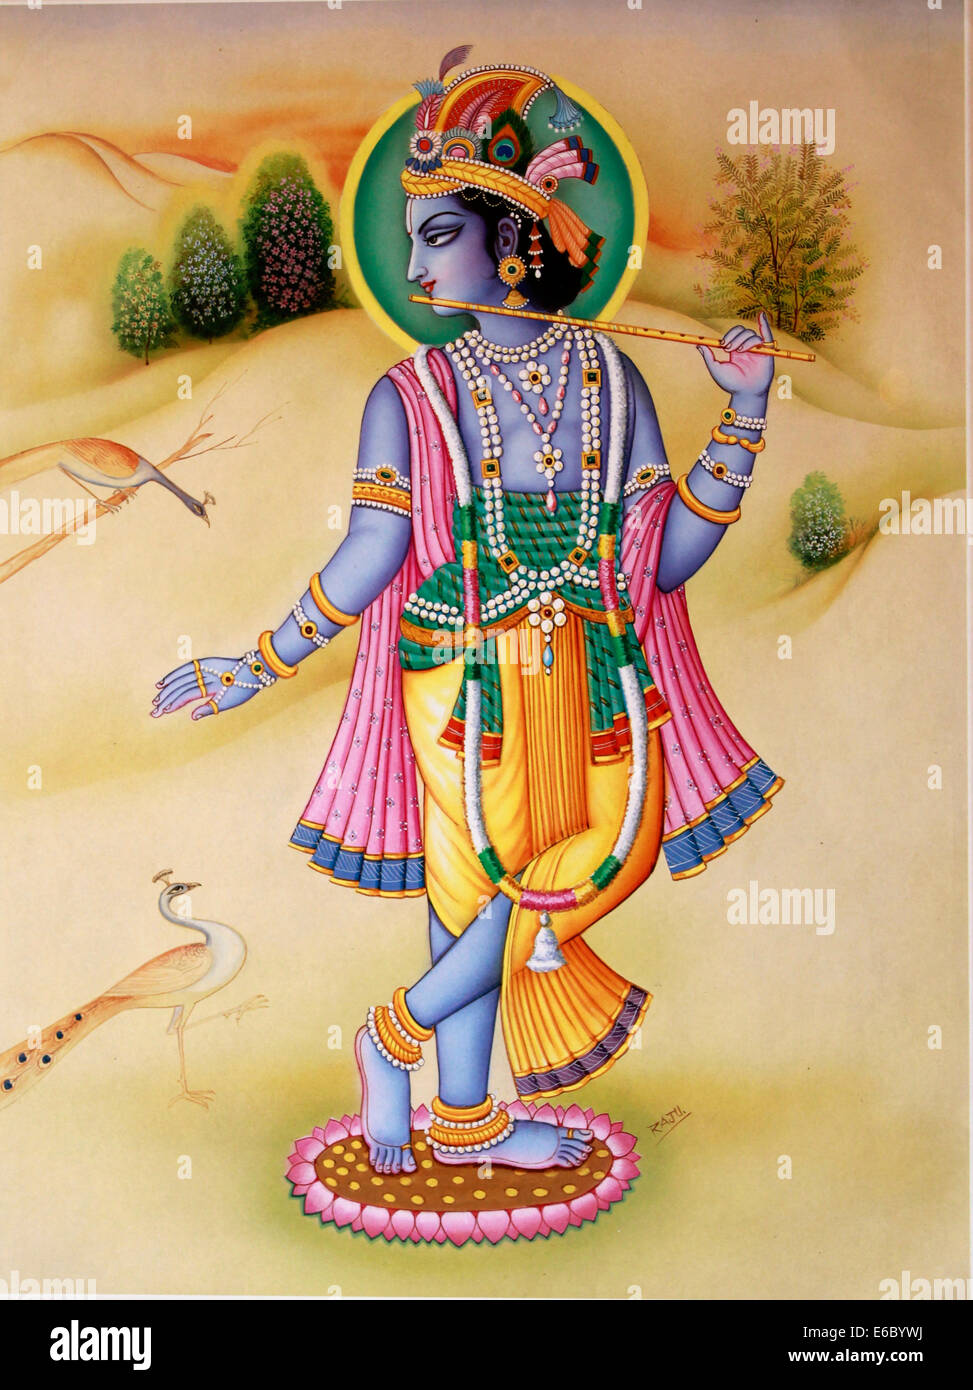 Krishna Art Stock Photos & Krishna Art Stock Images - Alamy